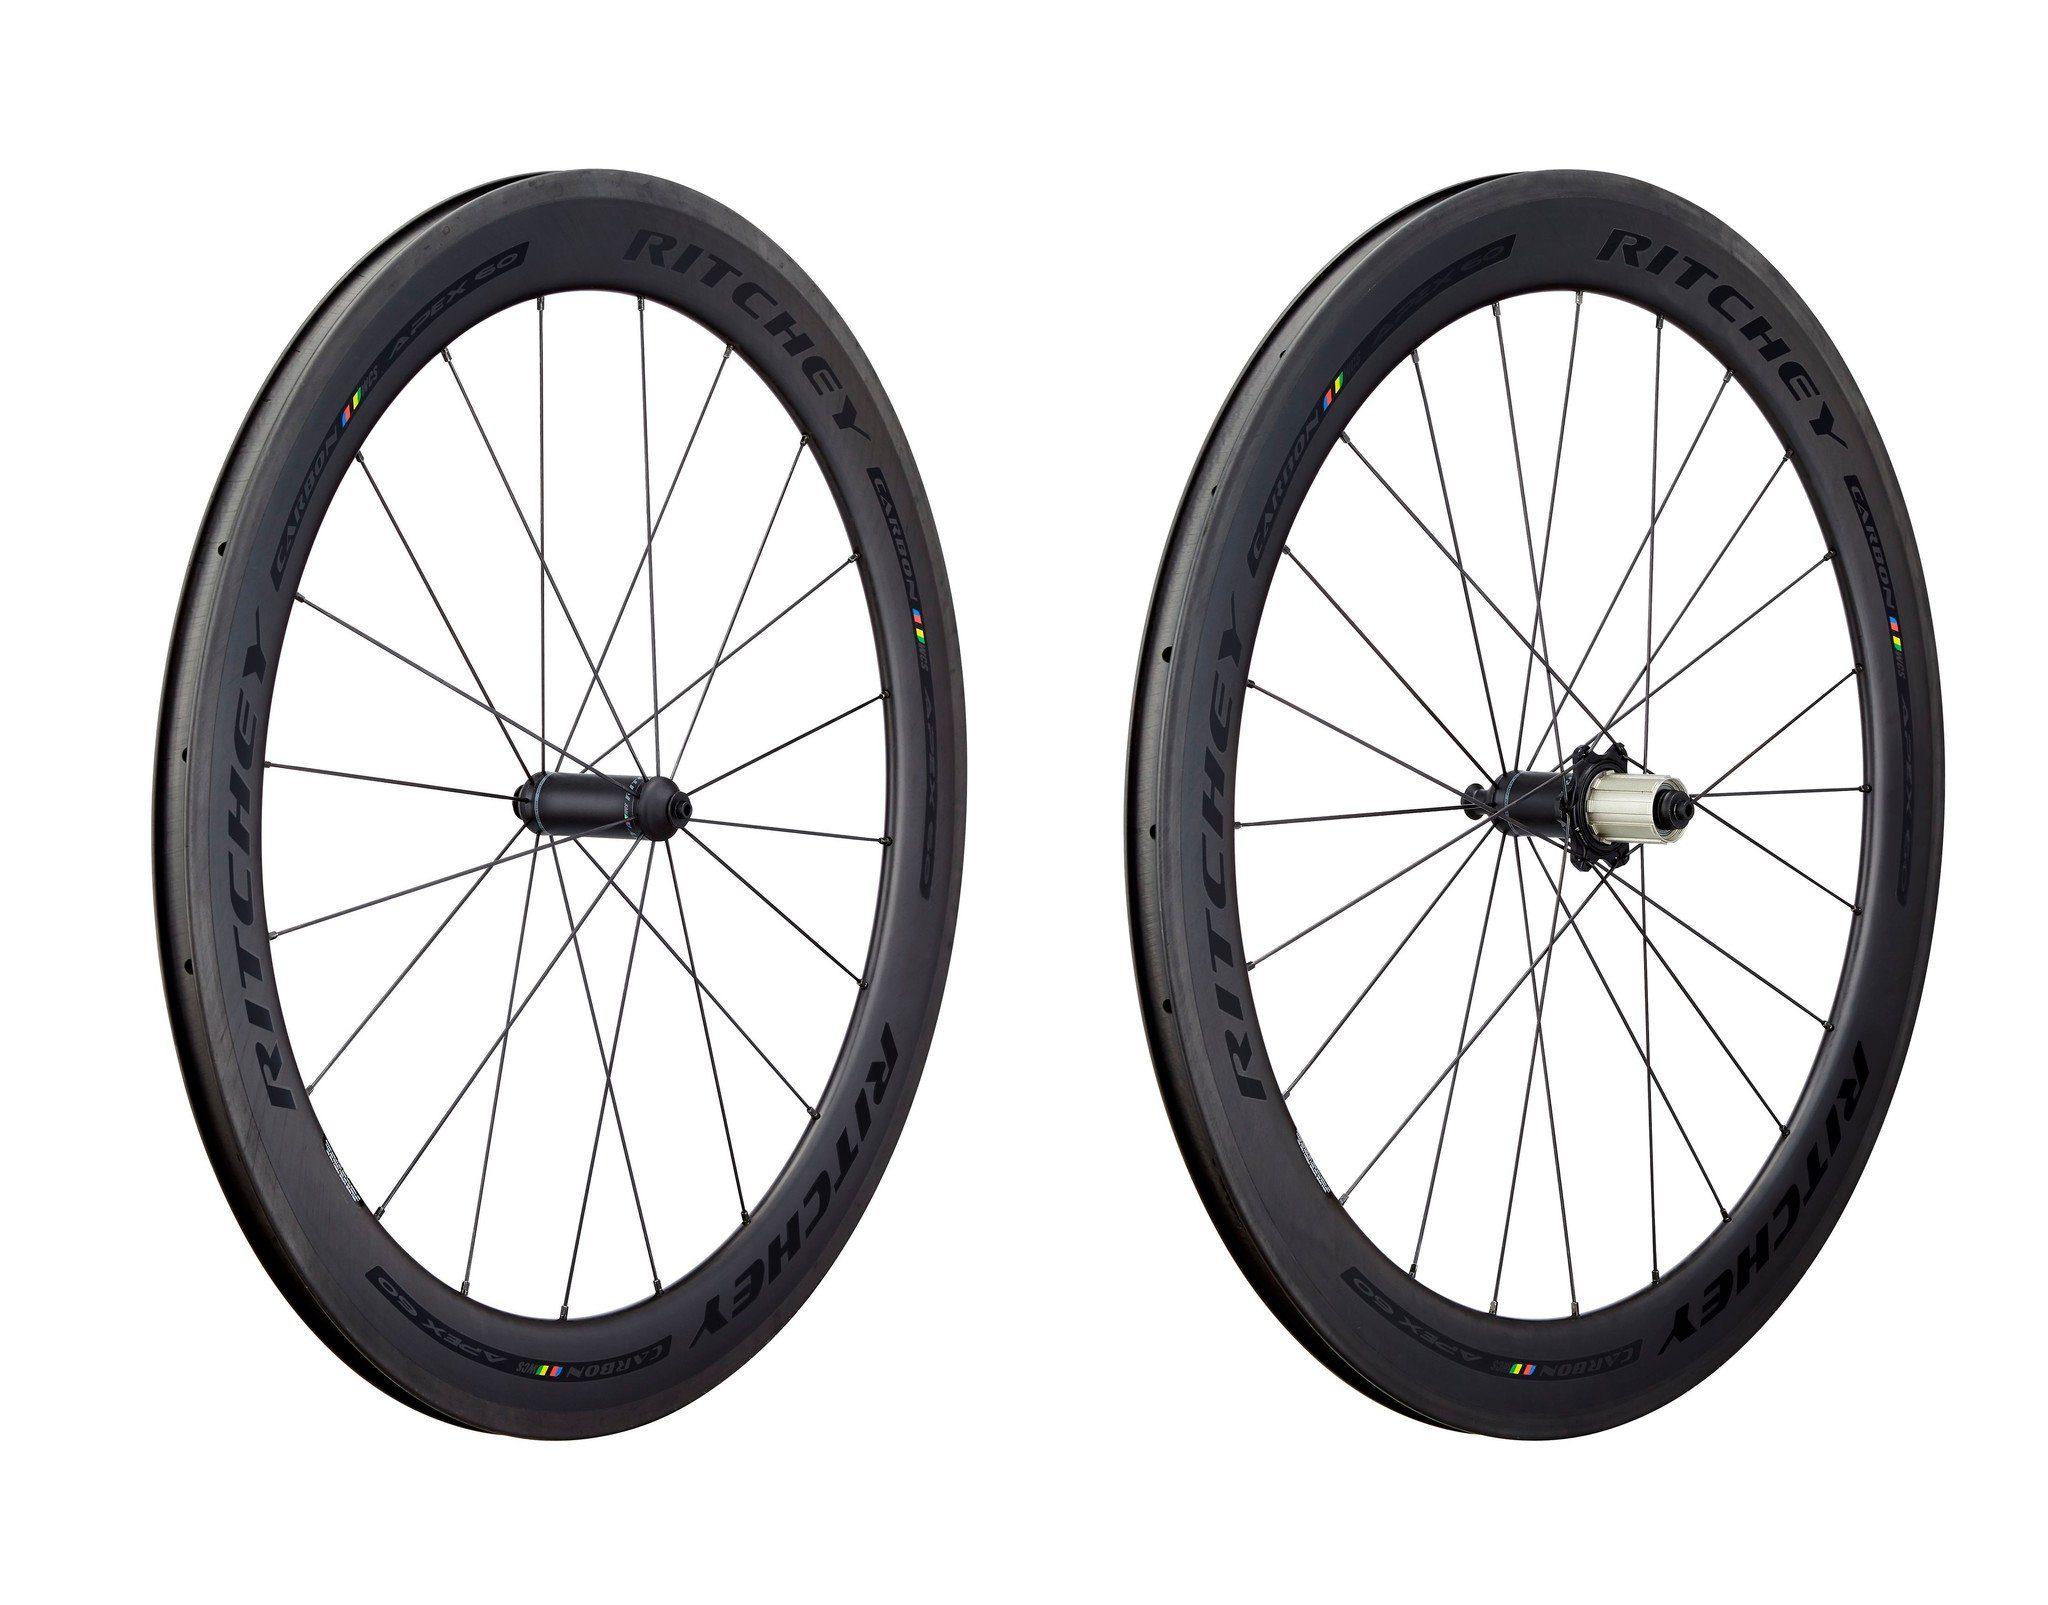 Ritchey Laufrad »WCS Apex II 60 Clincher Wheel Sets 700C«